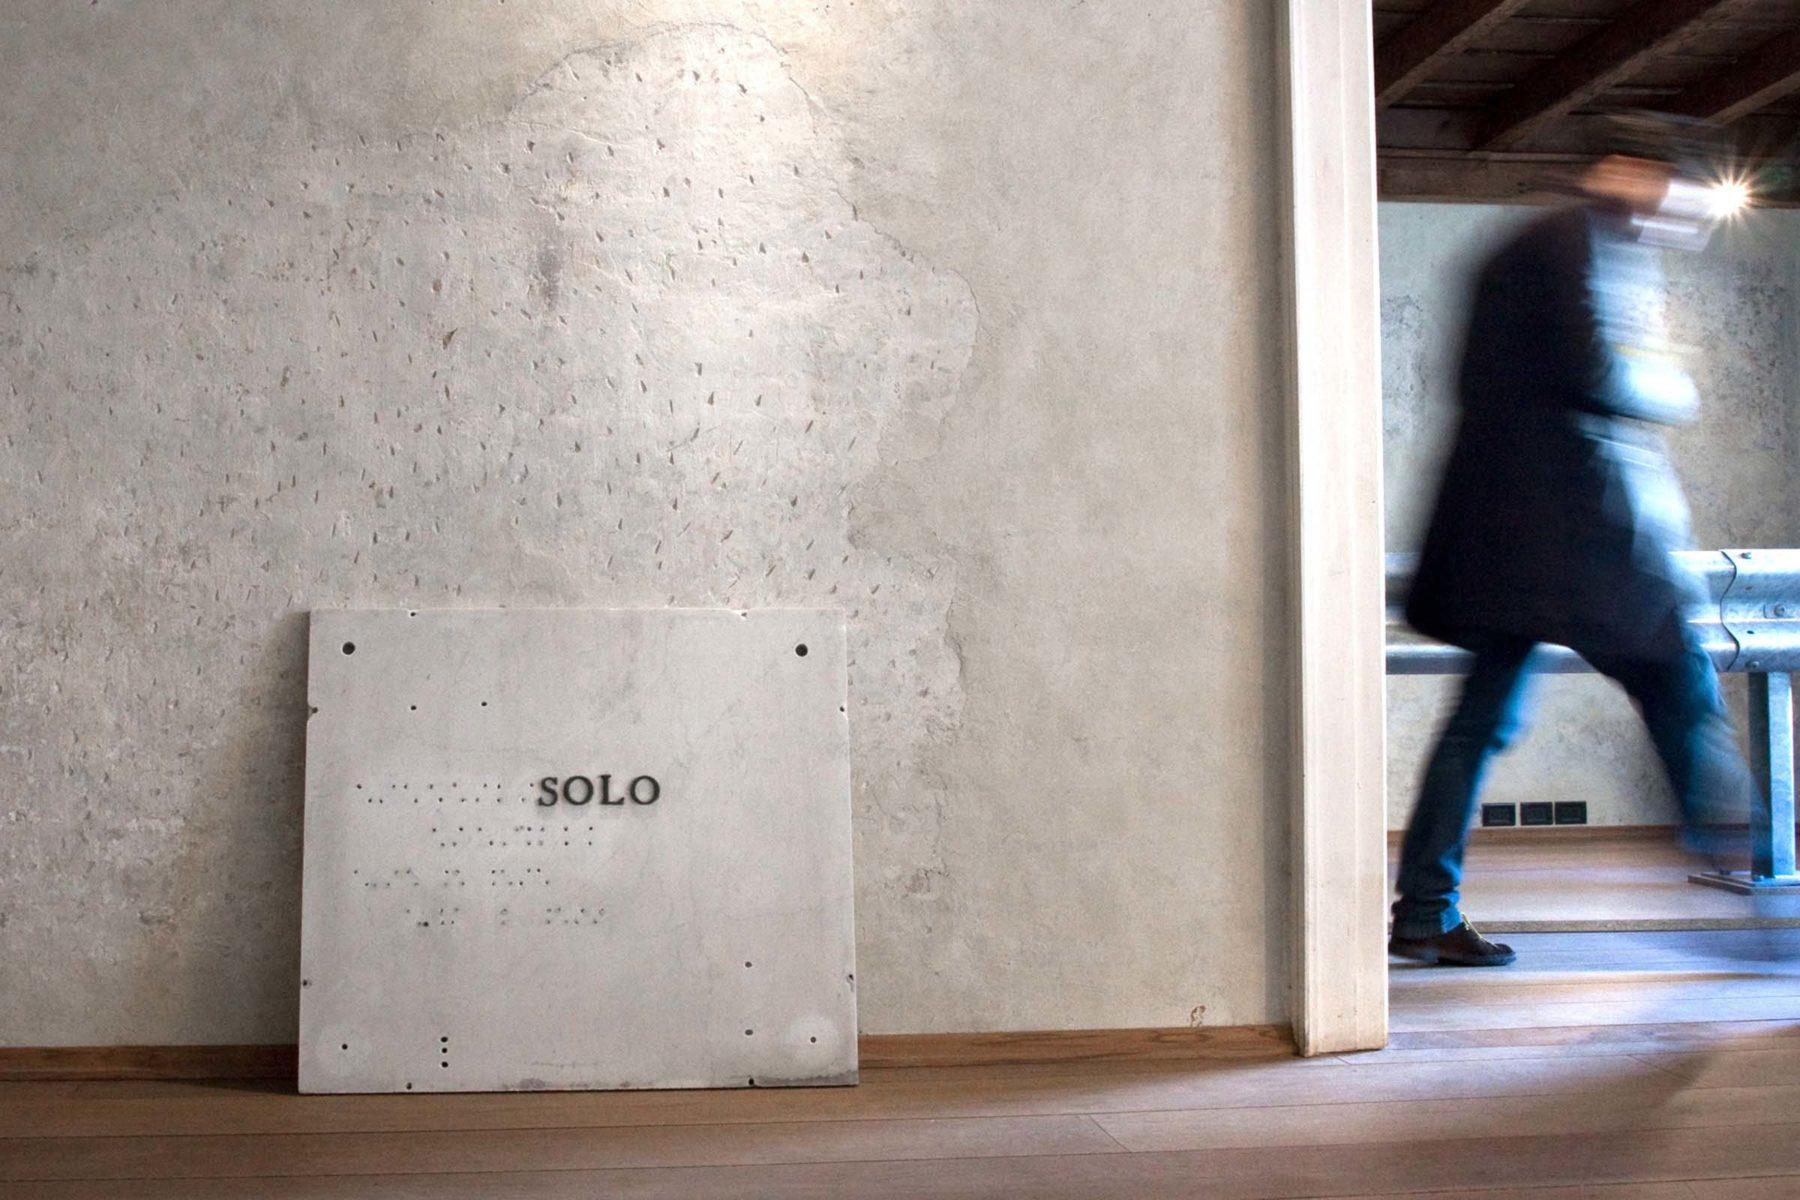 Matteo Attruia, Solo, 2011, marble, metal letters, 55 x 78 x 2 cm